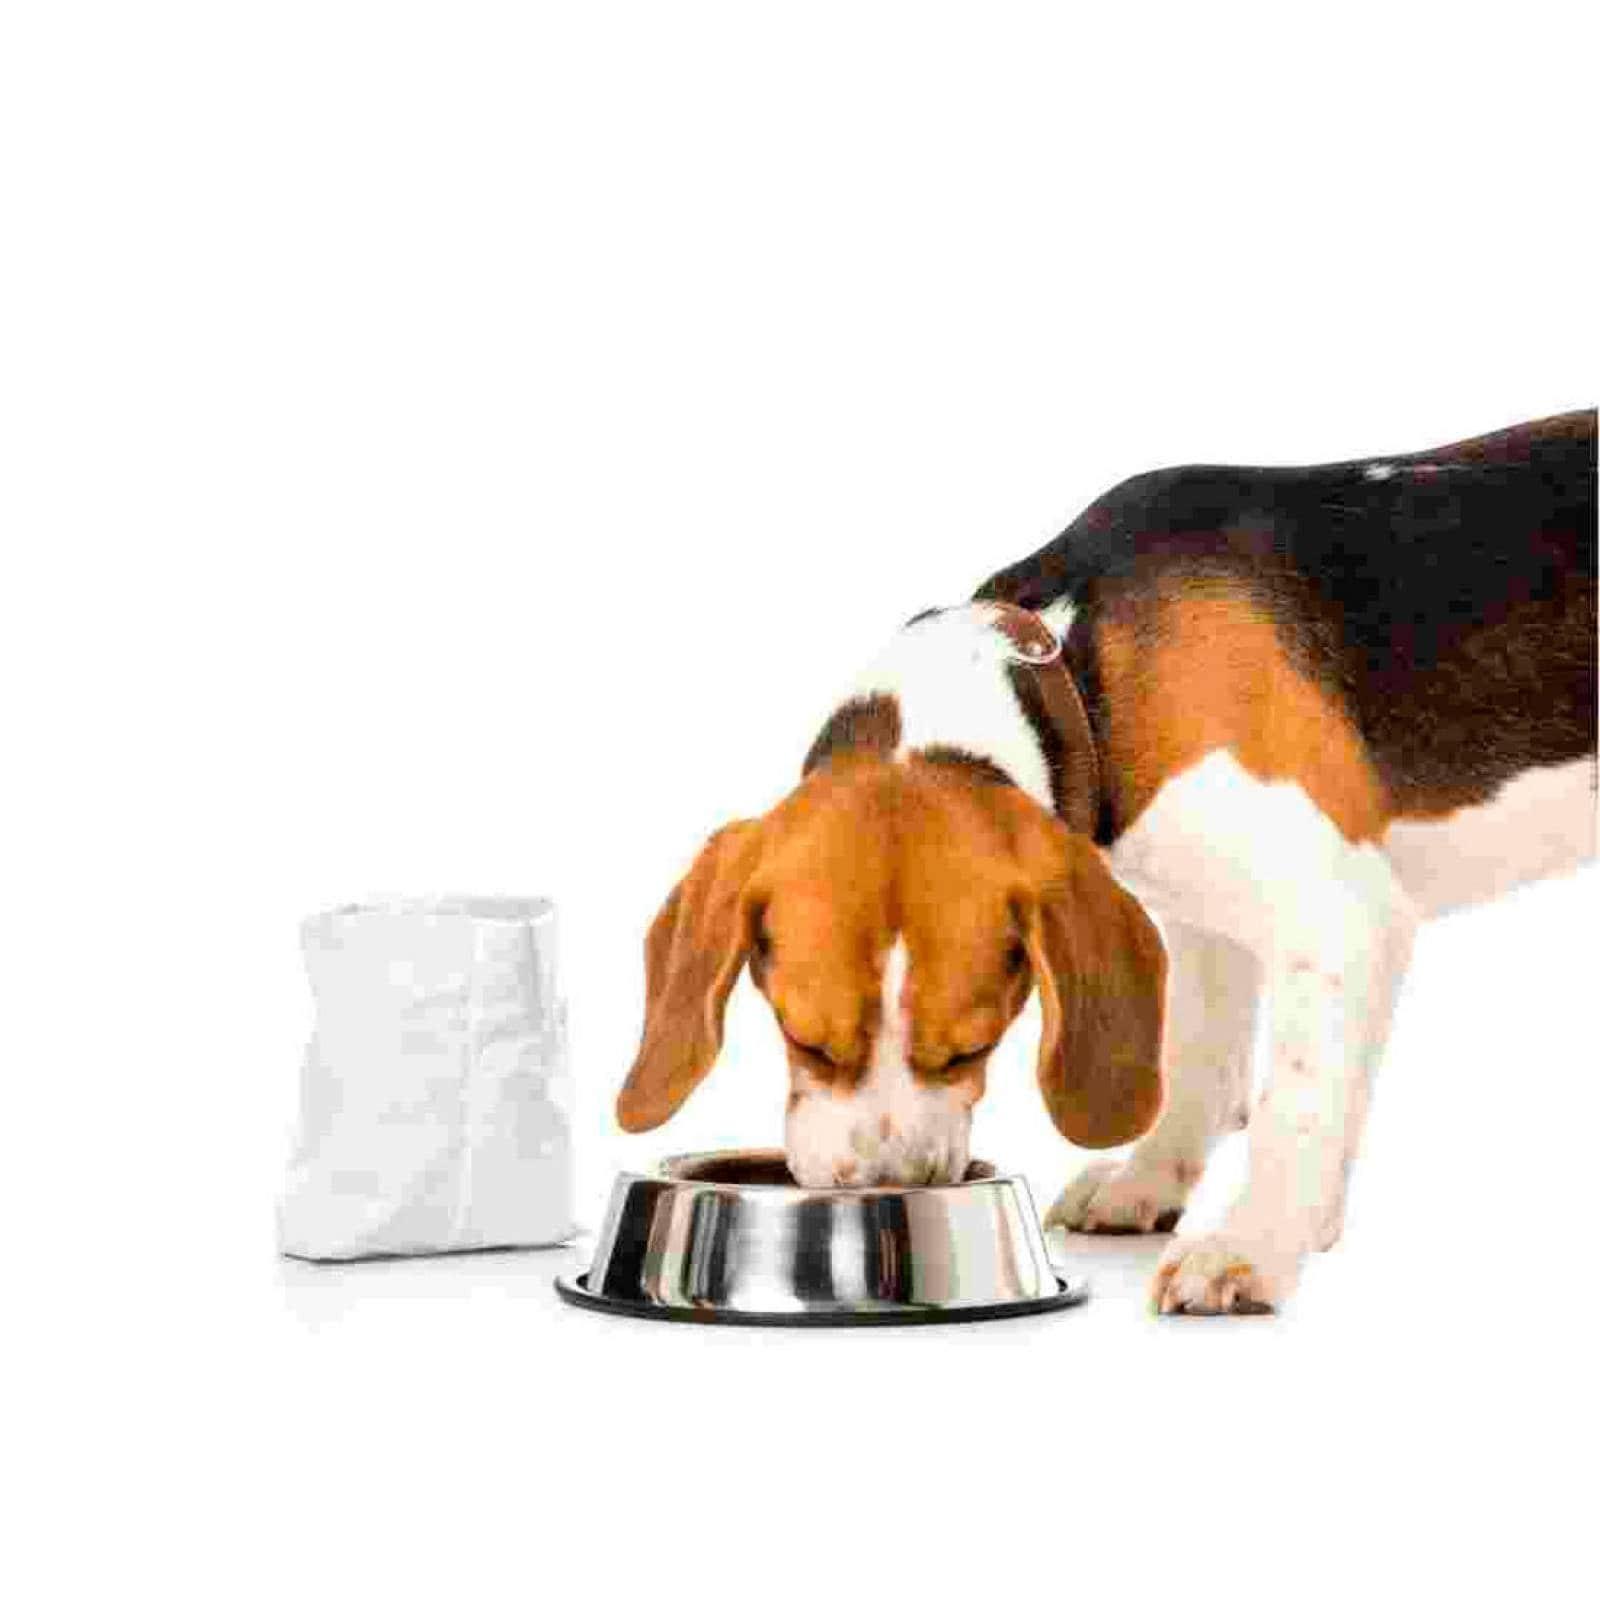 Kit Bulto Perro Adulto Pequeño + Premios Hill's Science Diet